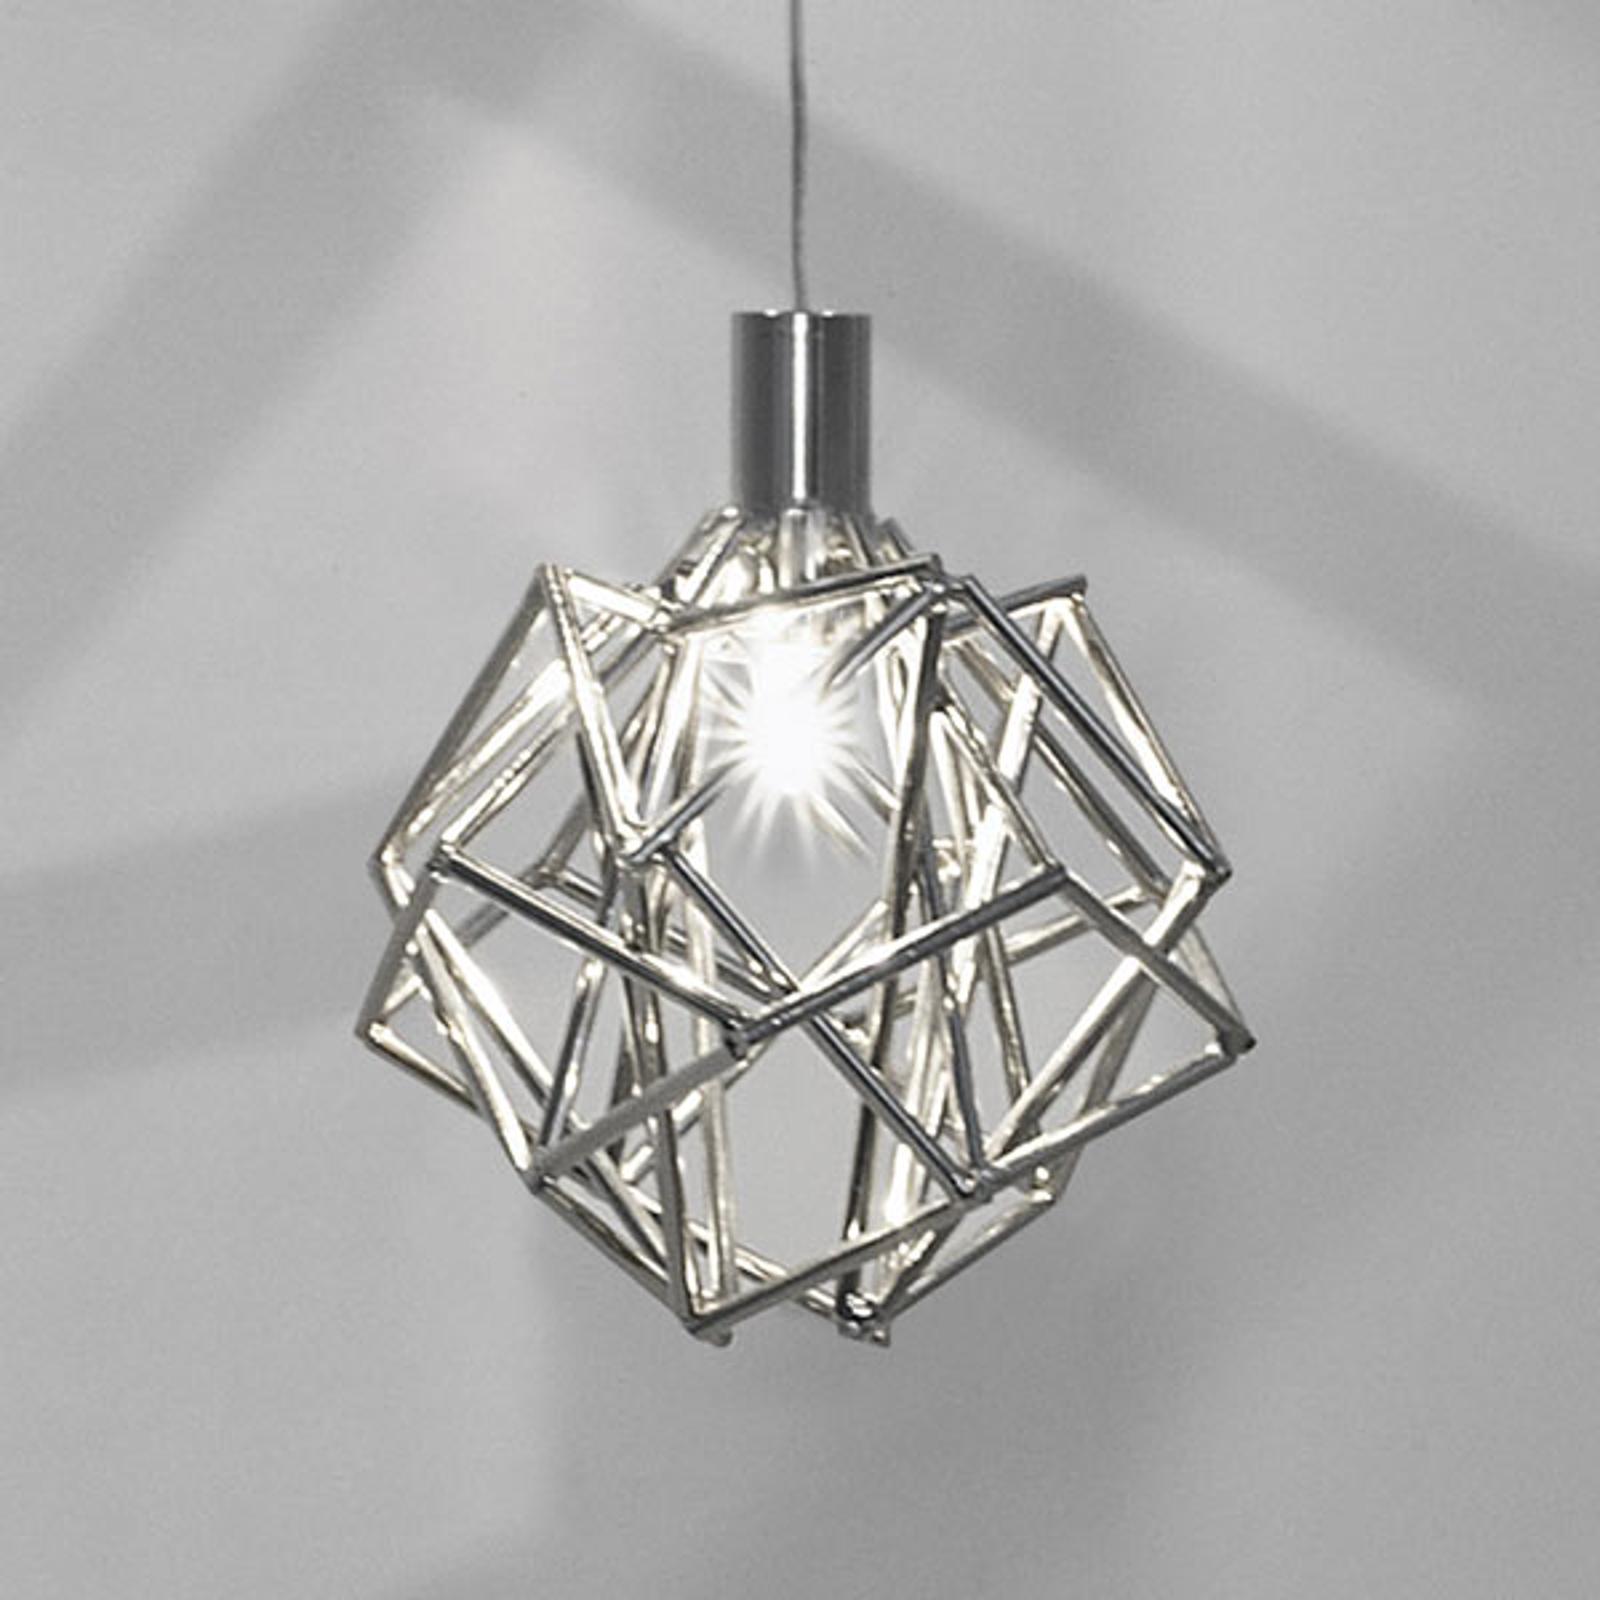 Terzani Etoile suspension de designer 1 lampe